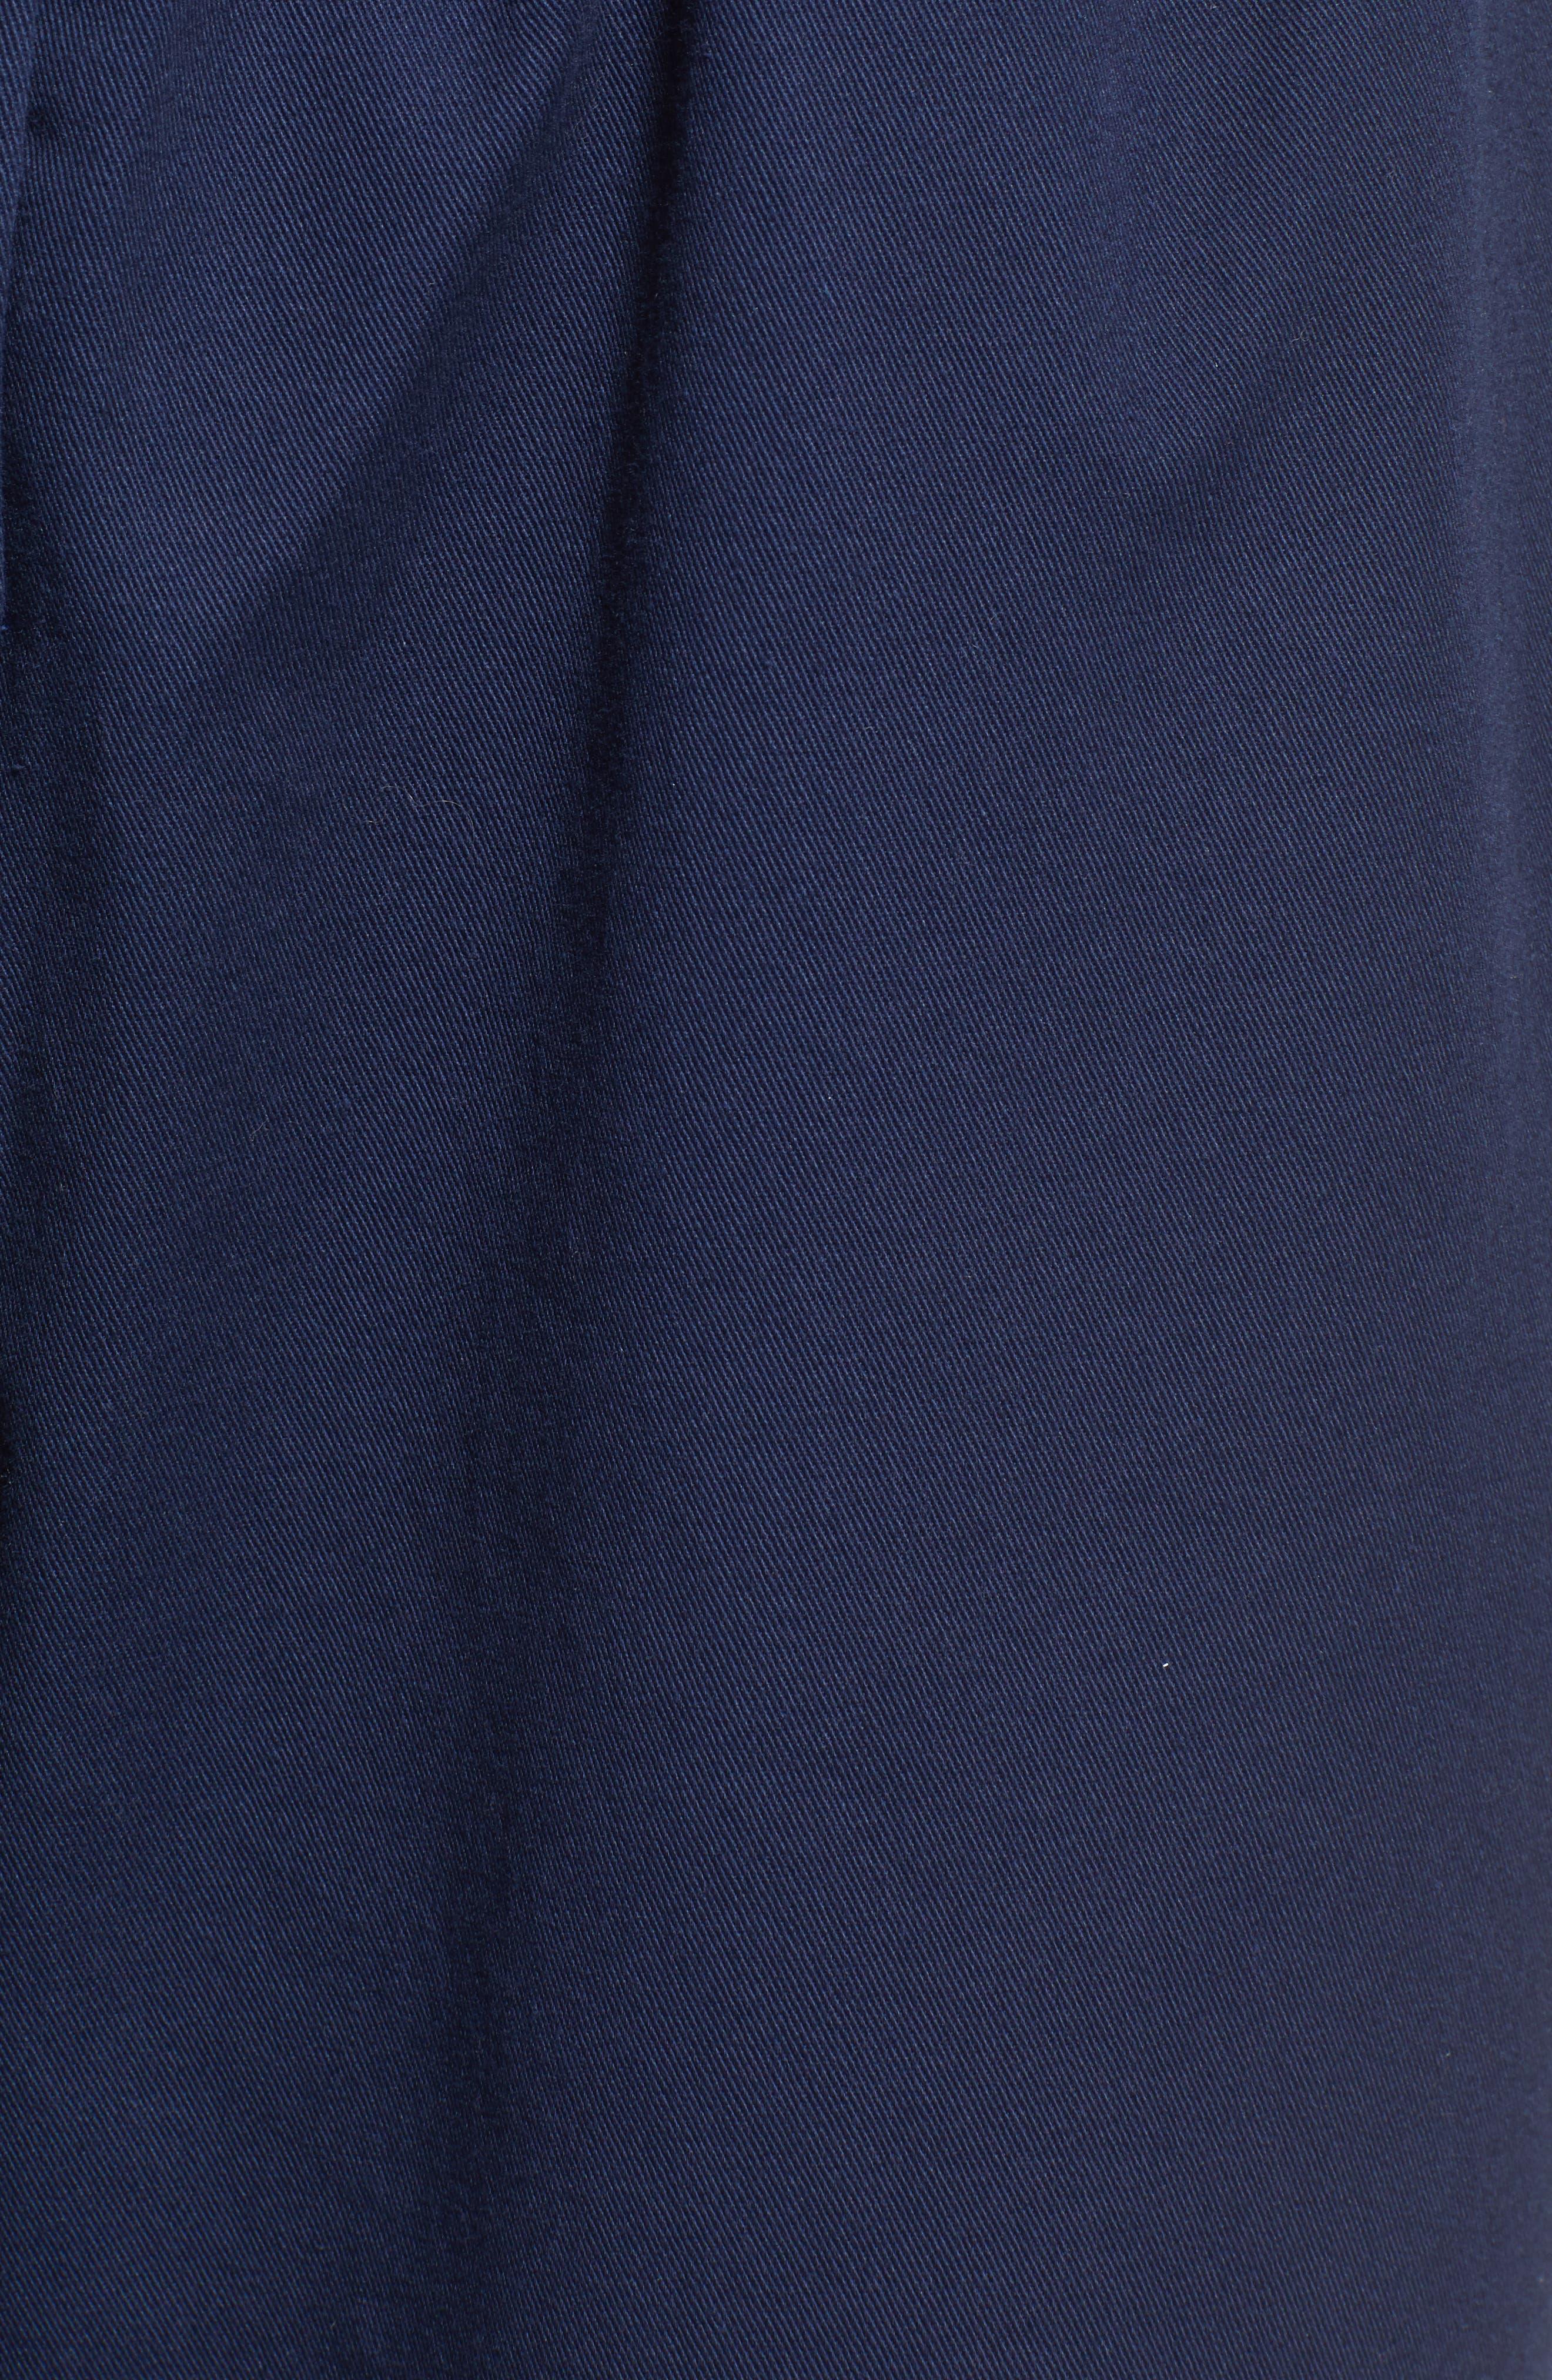 TEN SIXTY SHERMAN,                             Twill Workwear Jumpsuit,                             Alternate thumbnail 6, color,                             OXFORD BLUE